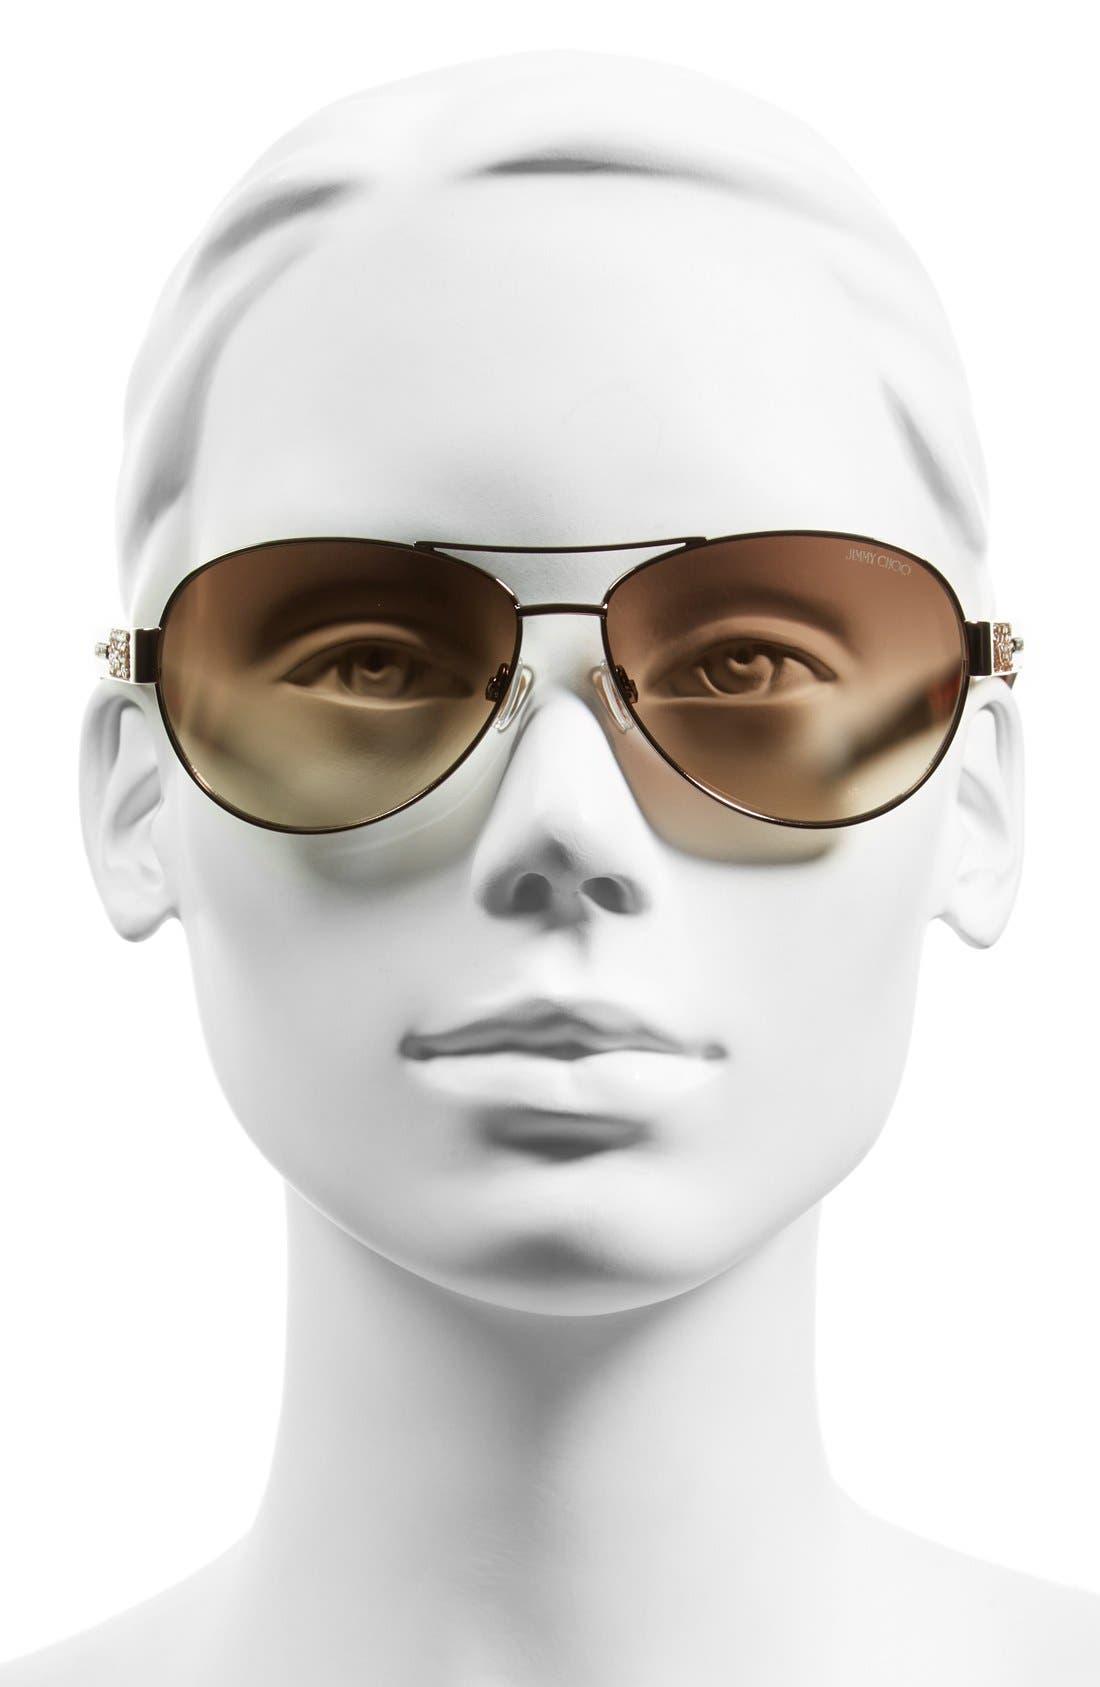 JIMMY CHOO,                             'Babas' 59mm Aviator Sunglasses,                             Alternate thumbnail 2, color,                             200